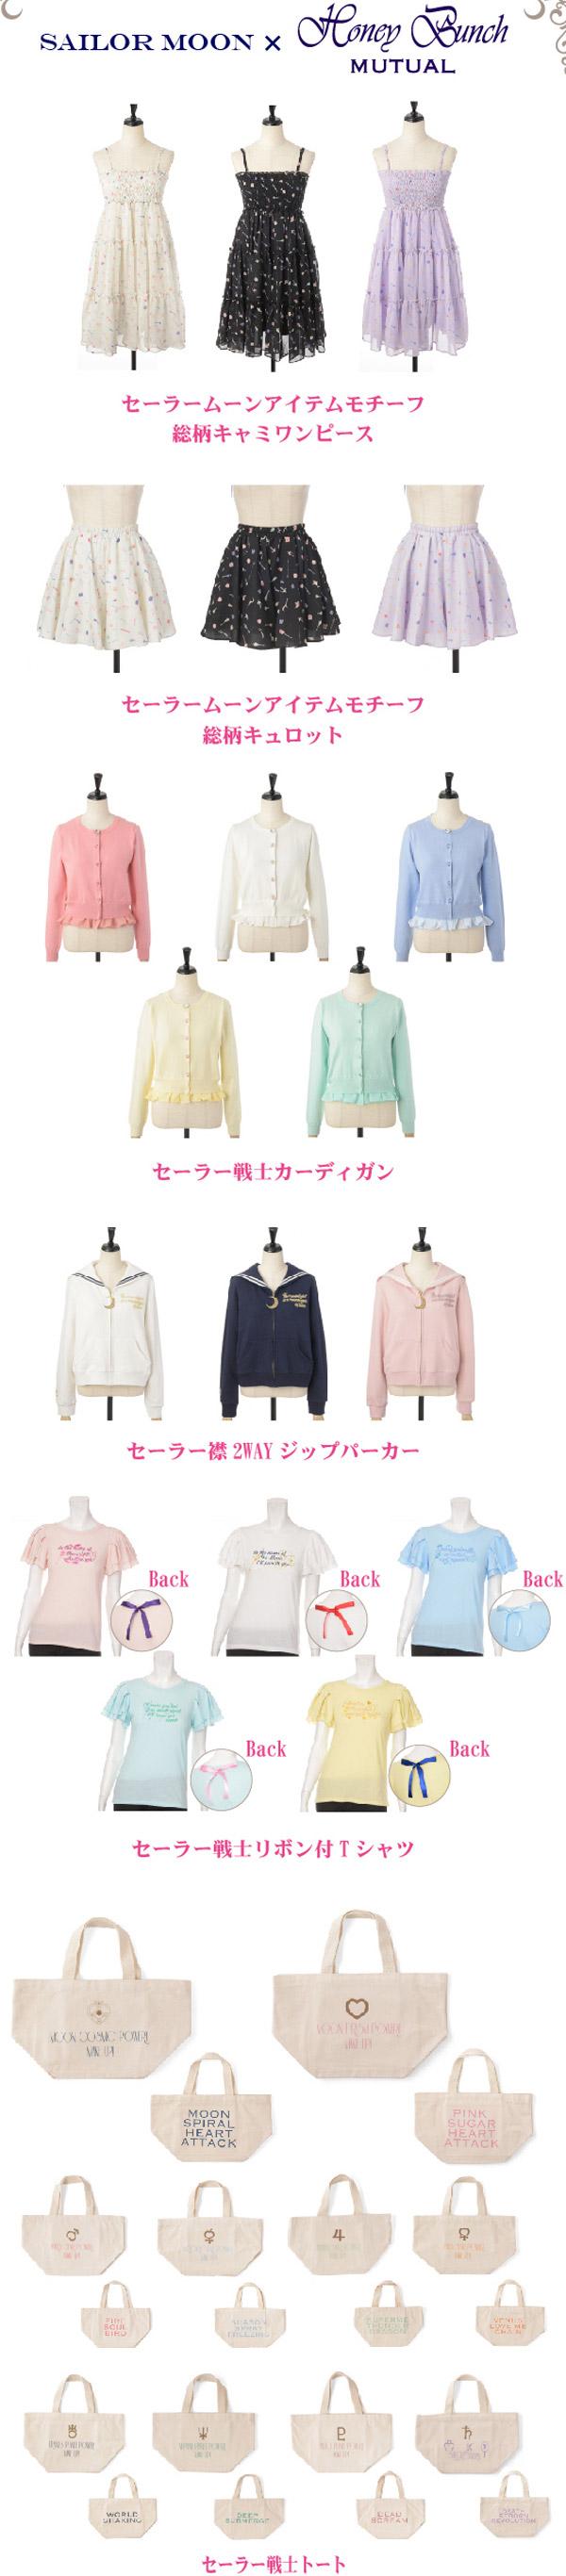 sailormoon-honey-bunch-mutual-clothing-collaboration2016